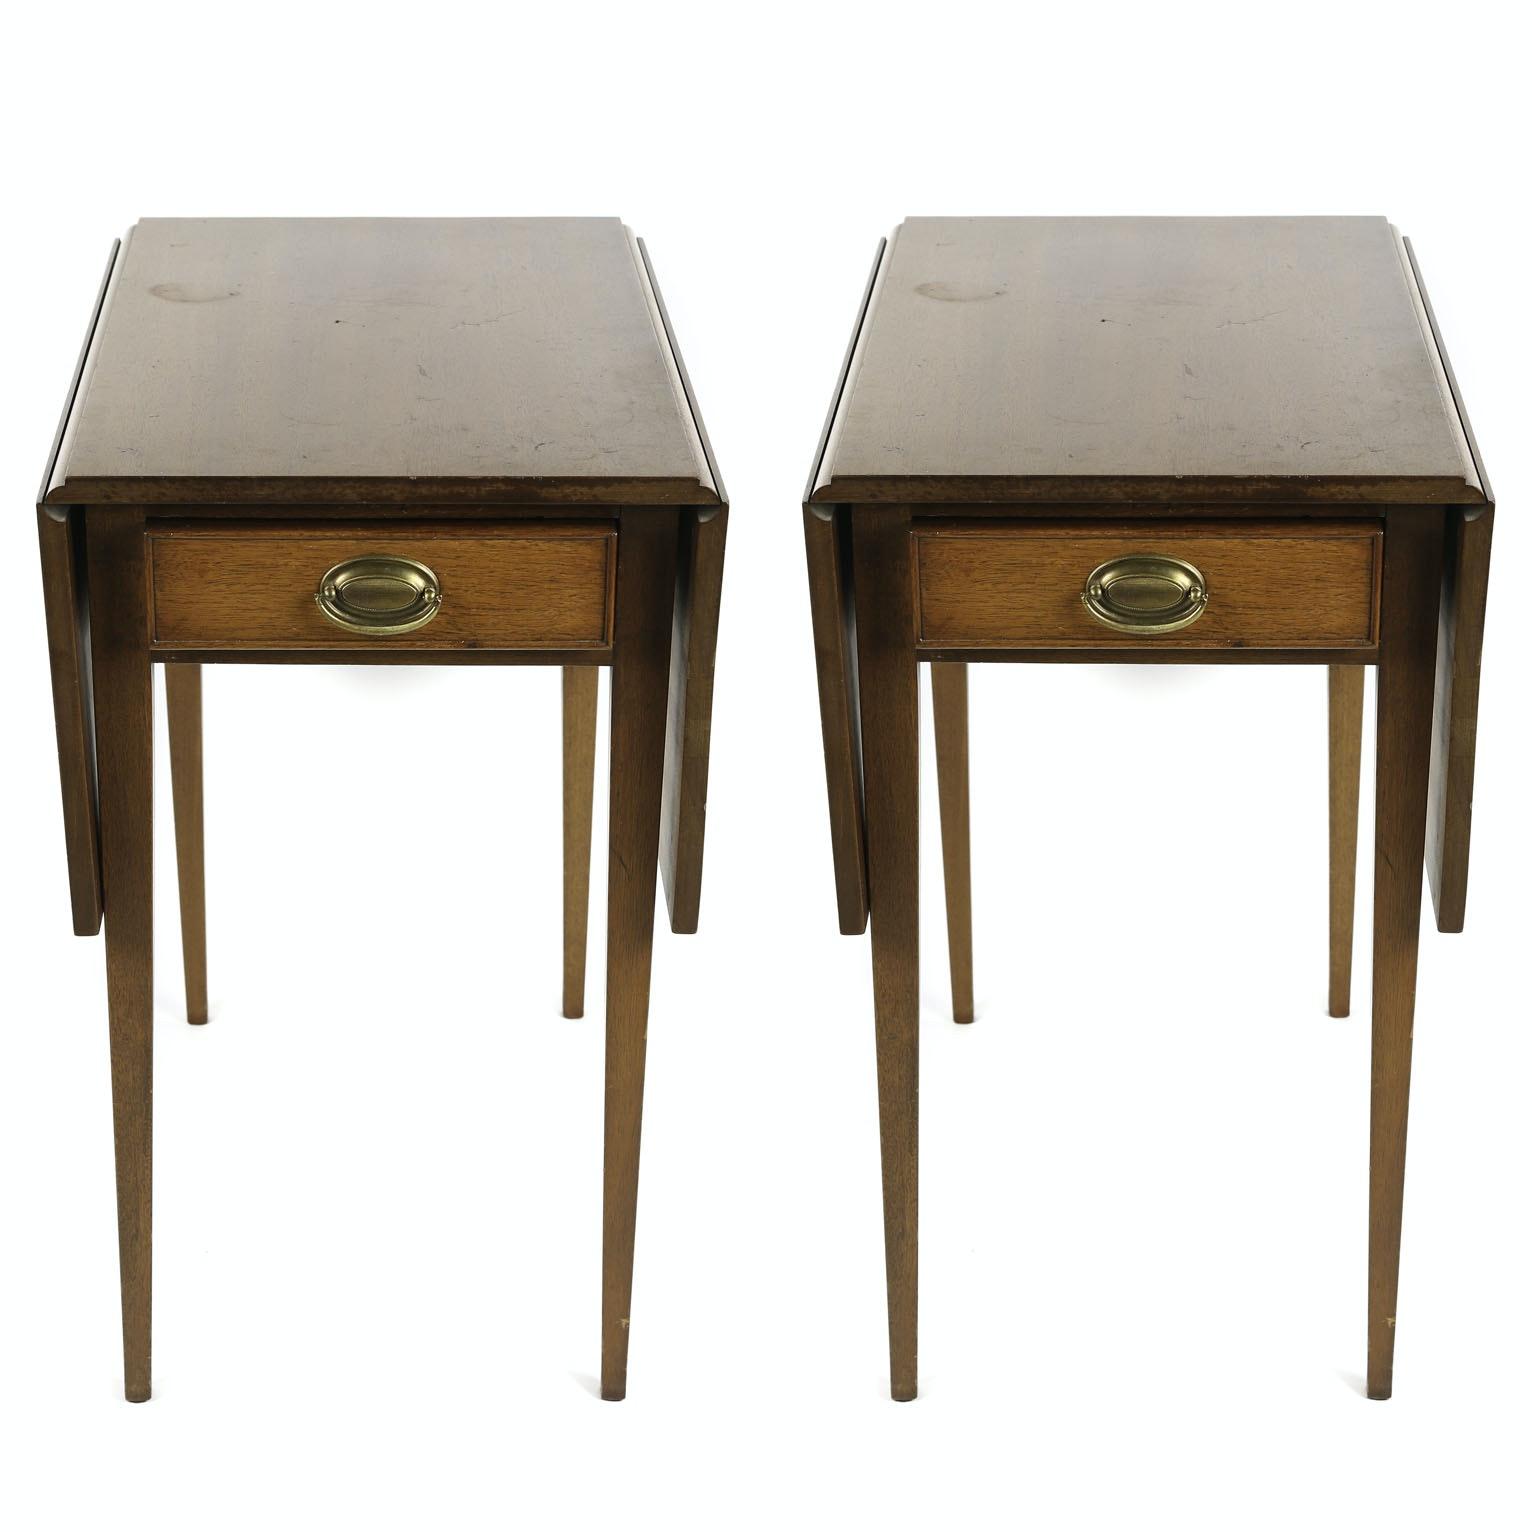 Federal Style Mahogany Pembroke Tables, 20th Century